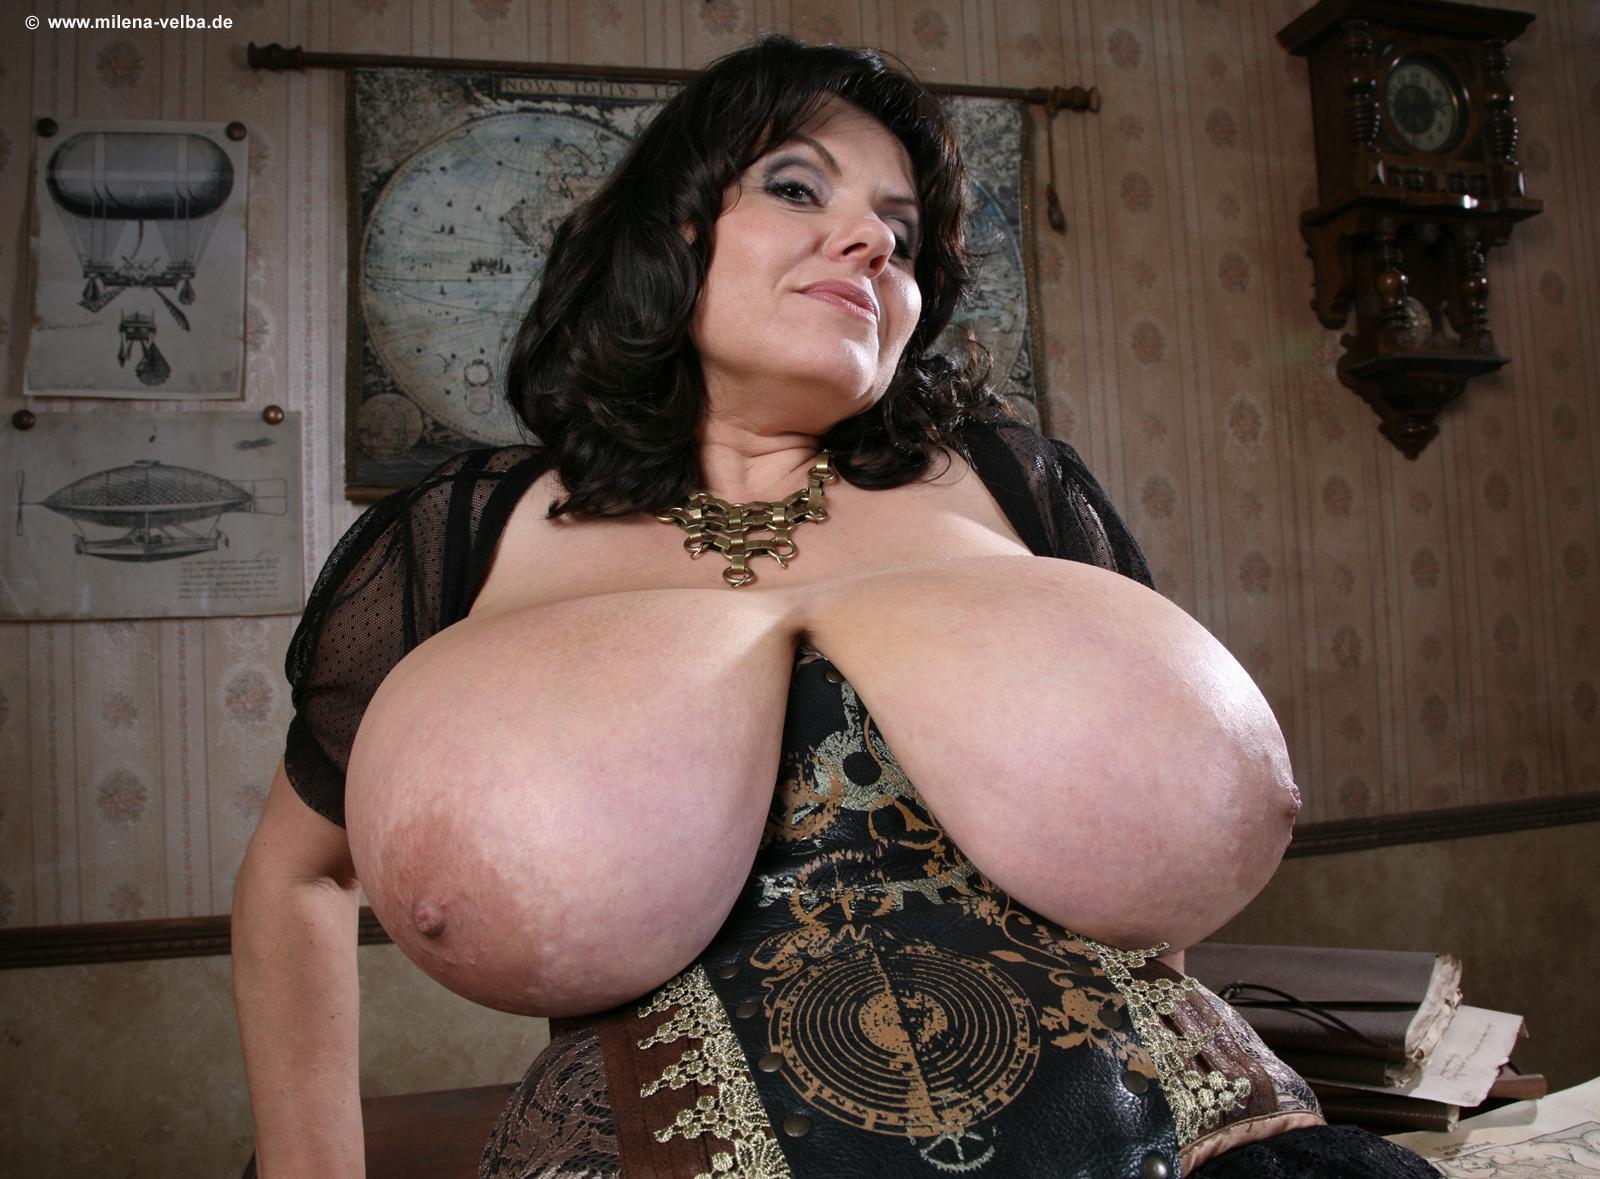 Milena Velba MILLK milena velba milk cuddly pic for sensuous milena velba